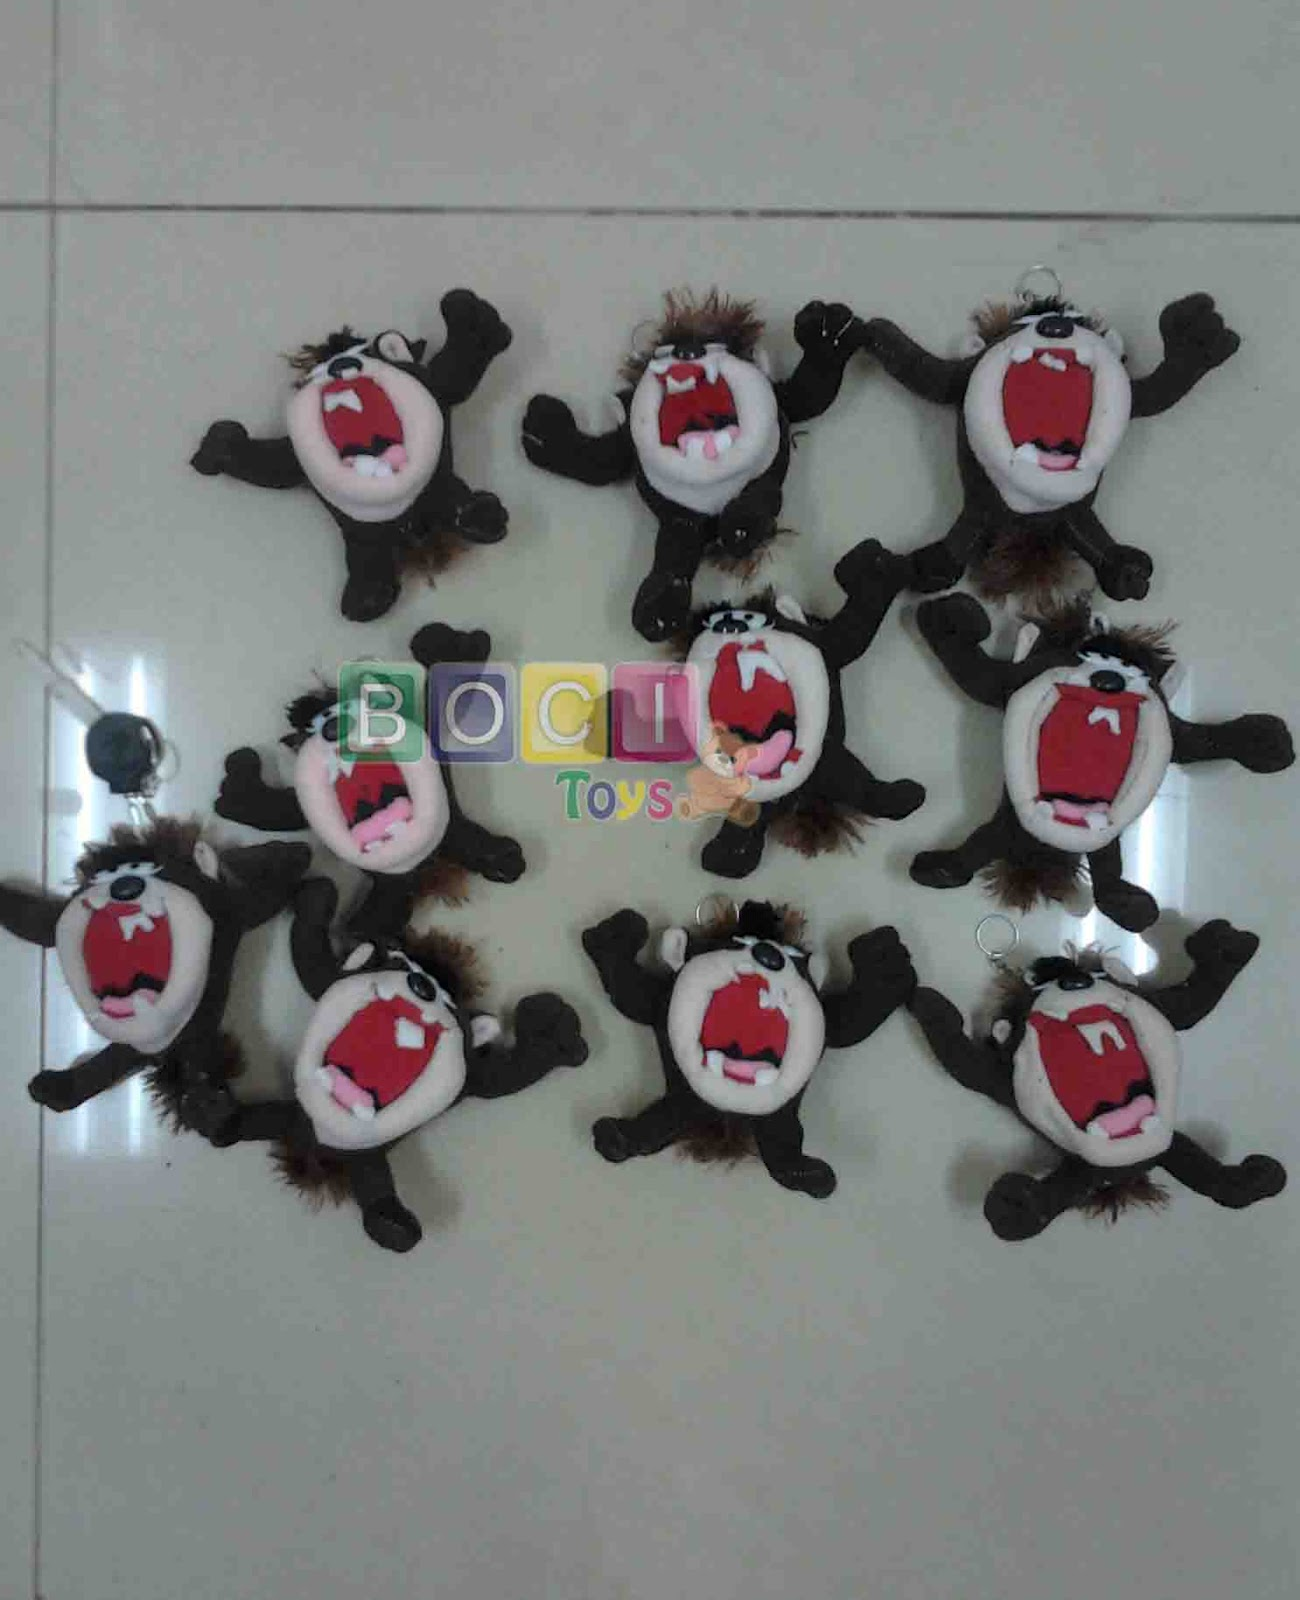 Boneka Tazmania - Harga Murah Produk Terbeken Di Indonesia 2cb9ebf687